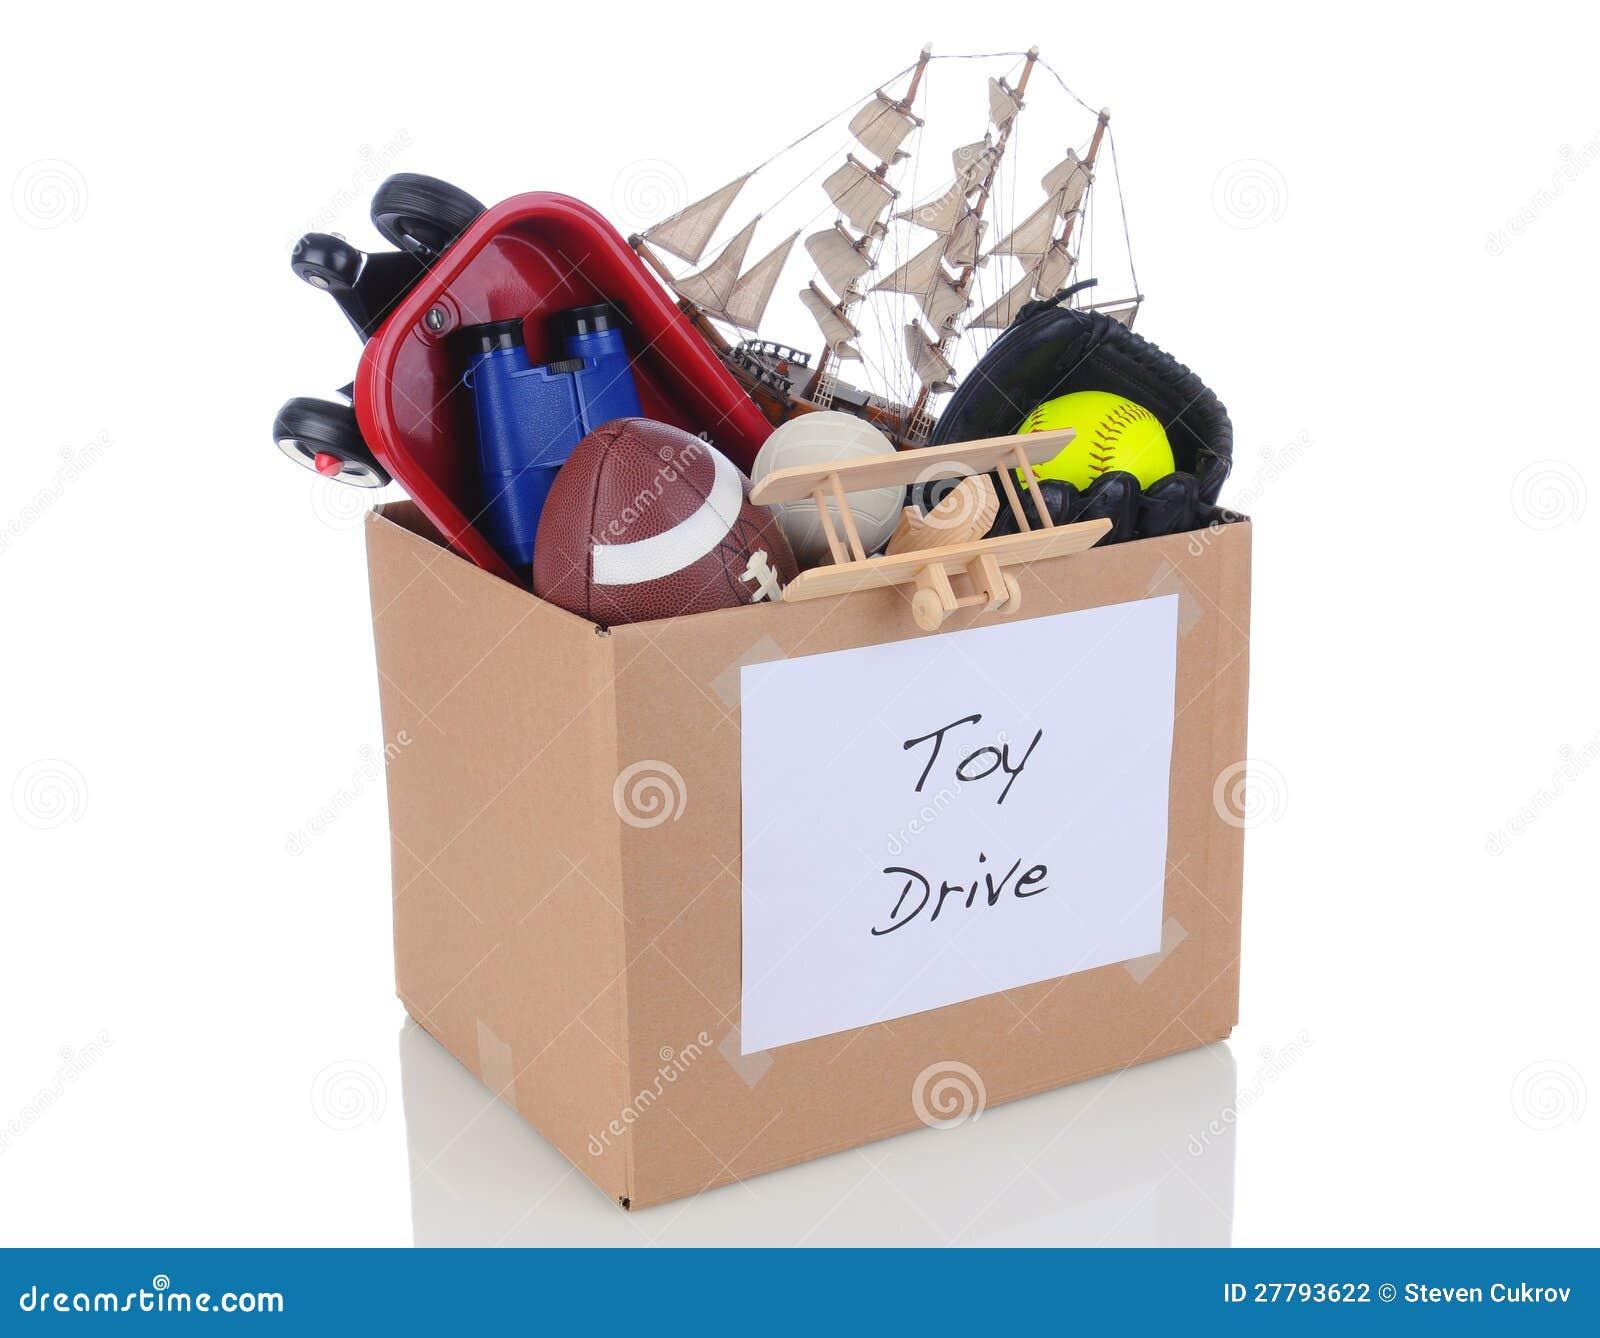 Toy Donation Application : Toy drive donation box stock photo image of binoculars